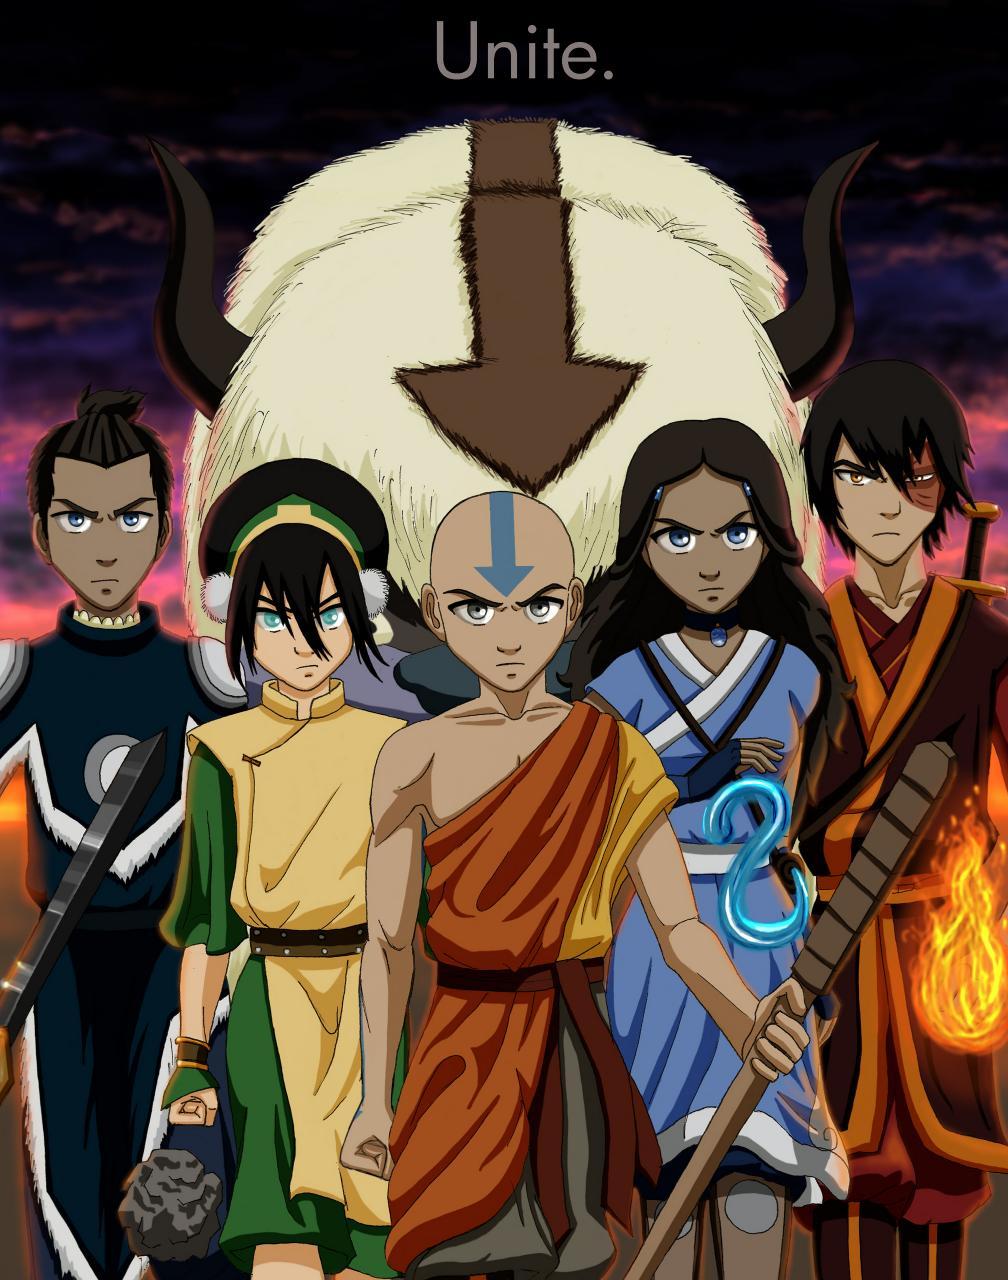 Avatar The Last Airbender Skins Minecraft Blog